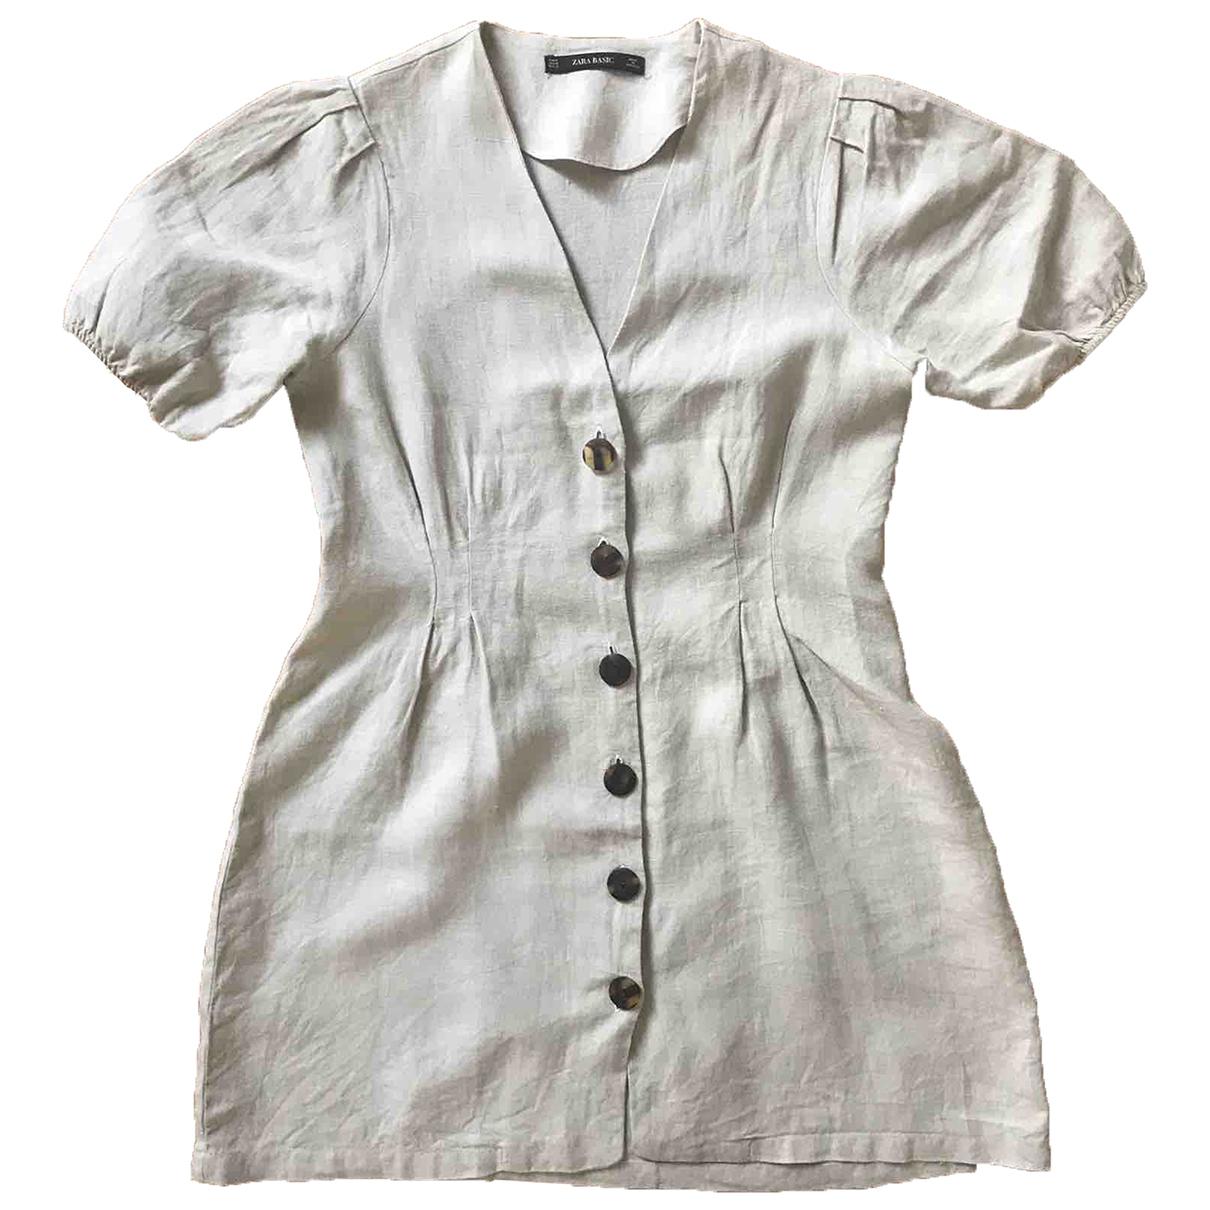 Zara - Robe   pour femme en lin - ecru